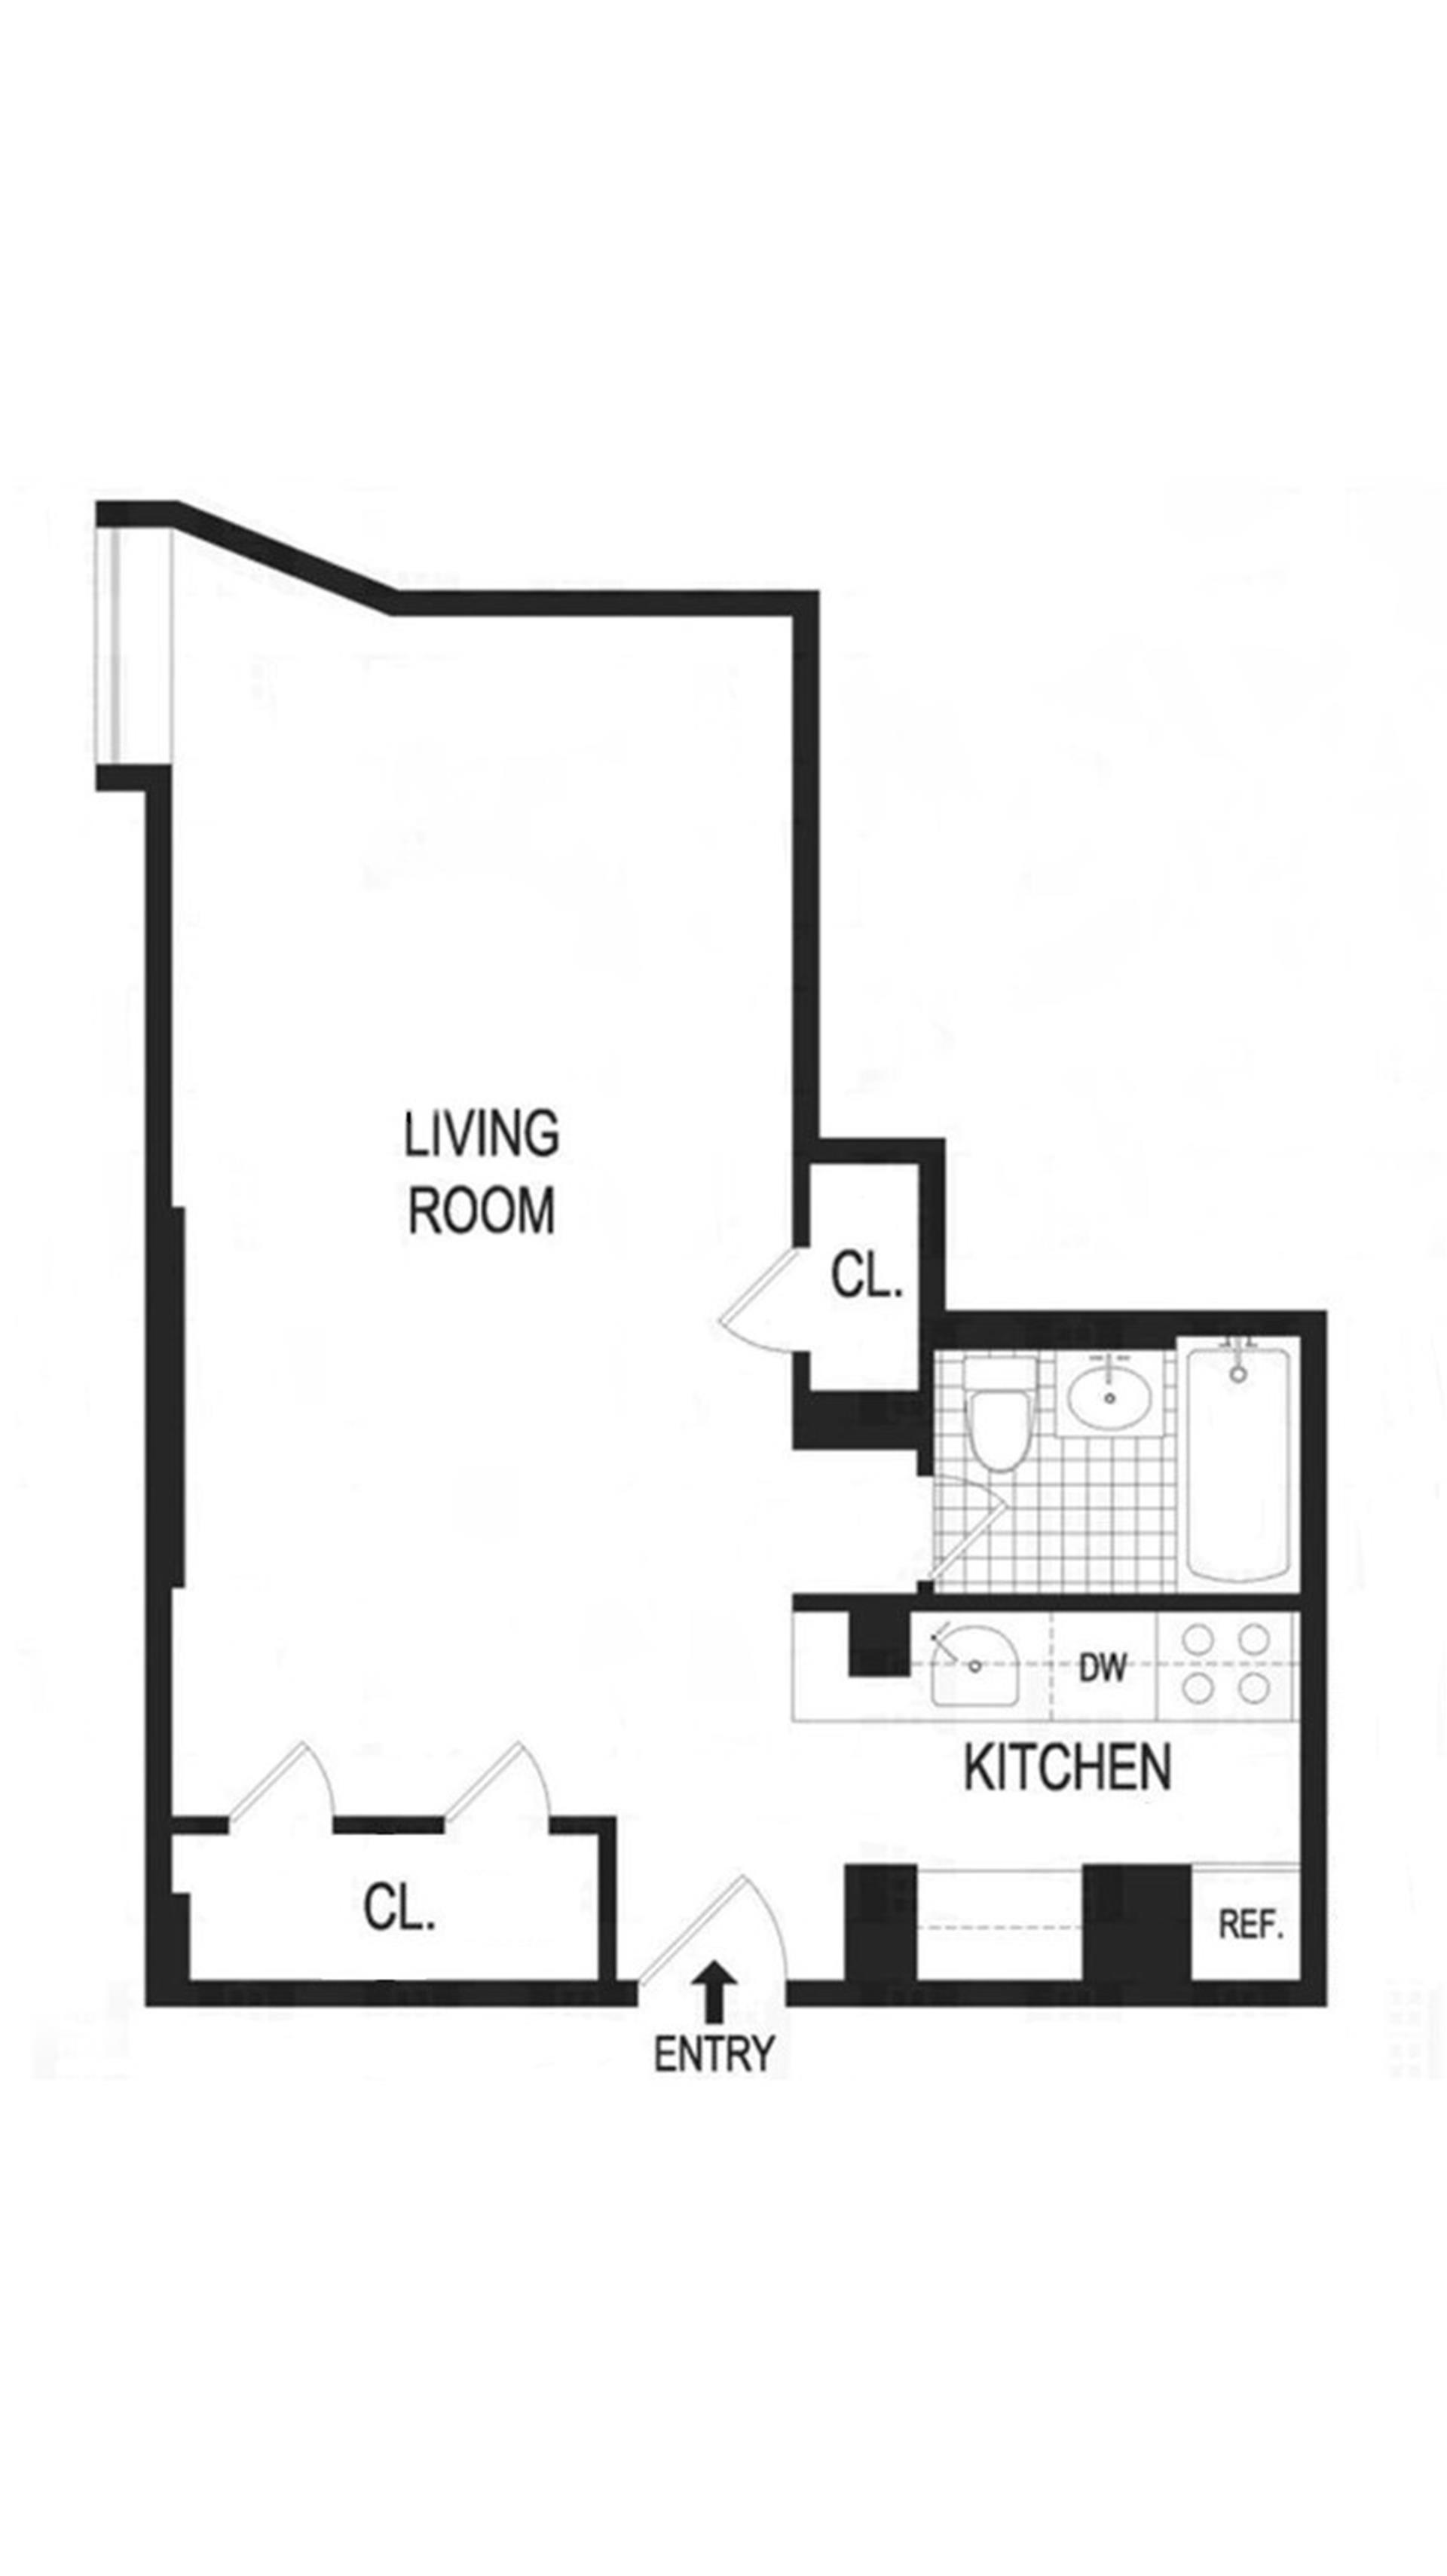 Floor plan of 720 Greenwich St, 3M - West Village - Meatpacking District, New York